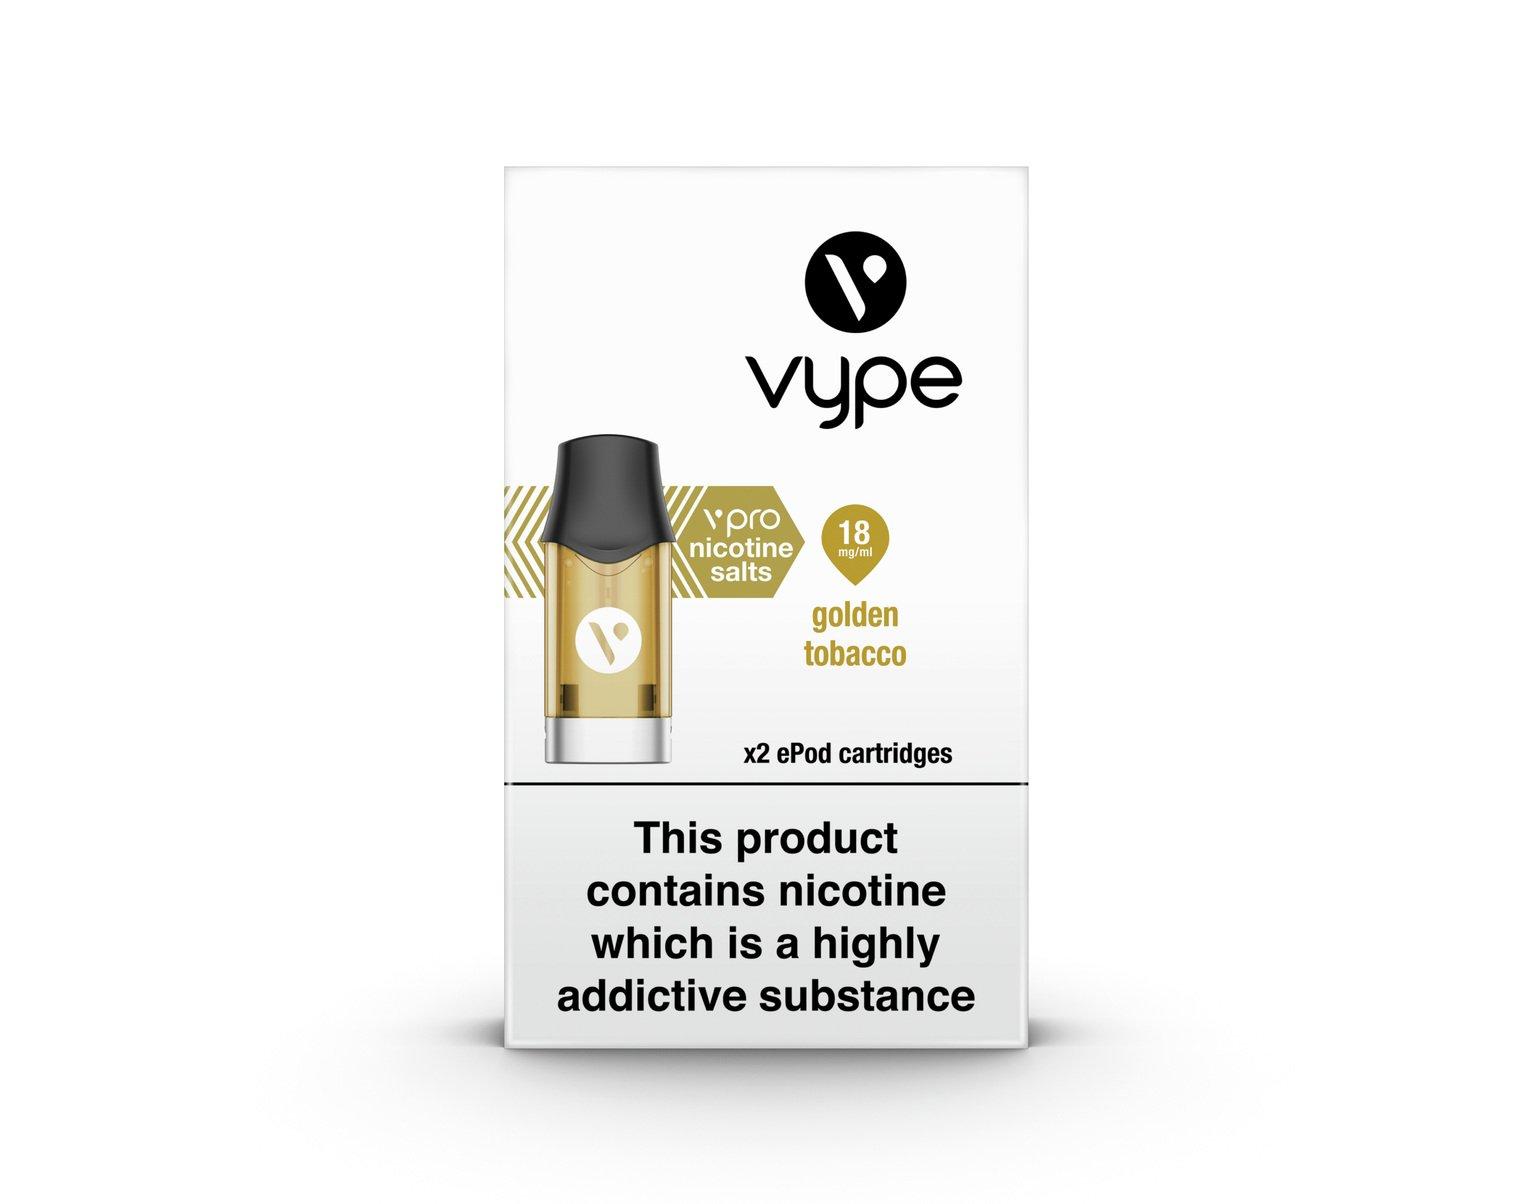 Vype Golden Tobacco Epod Refill